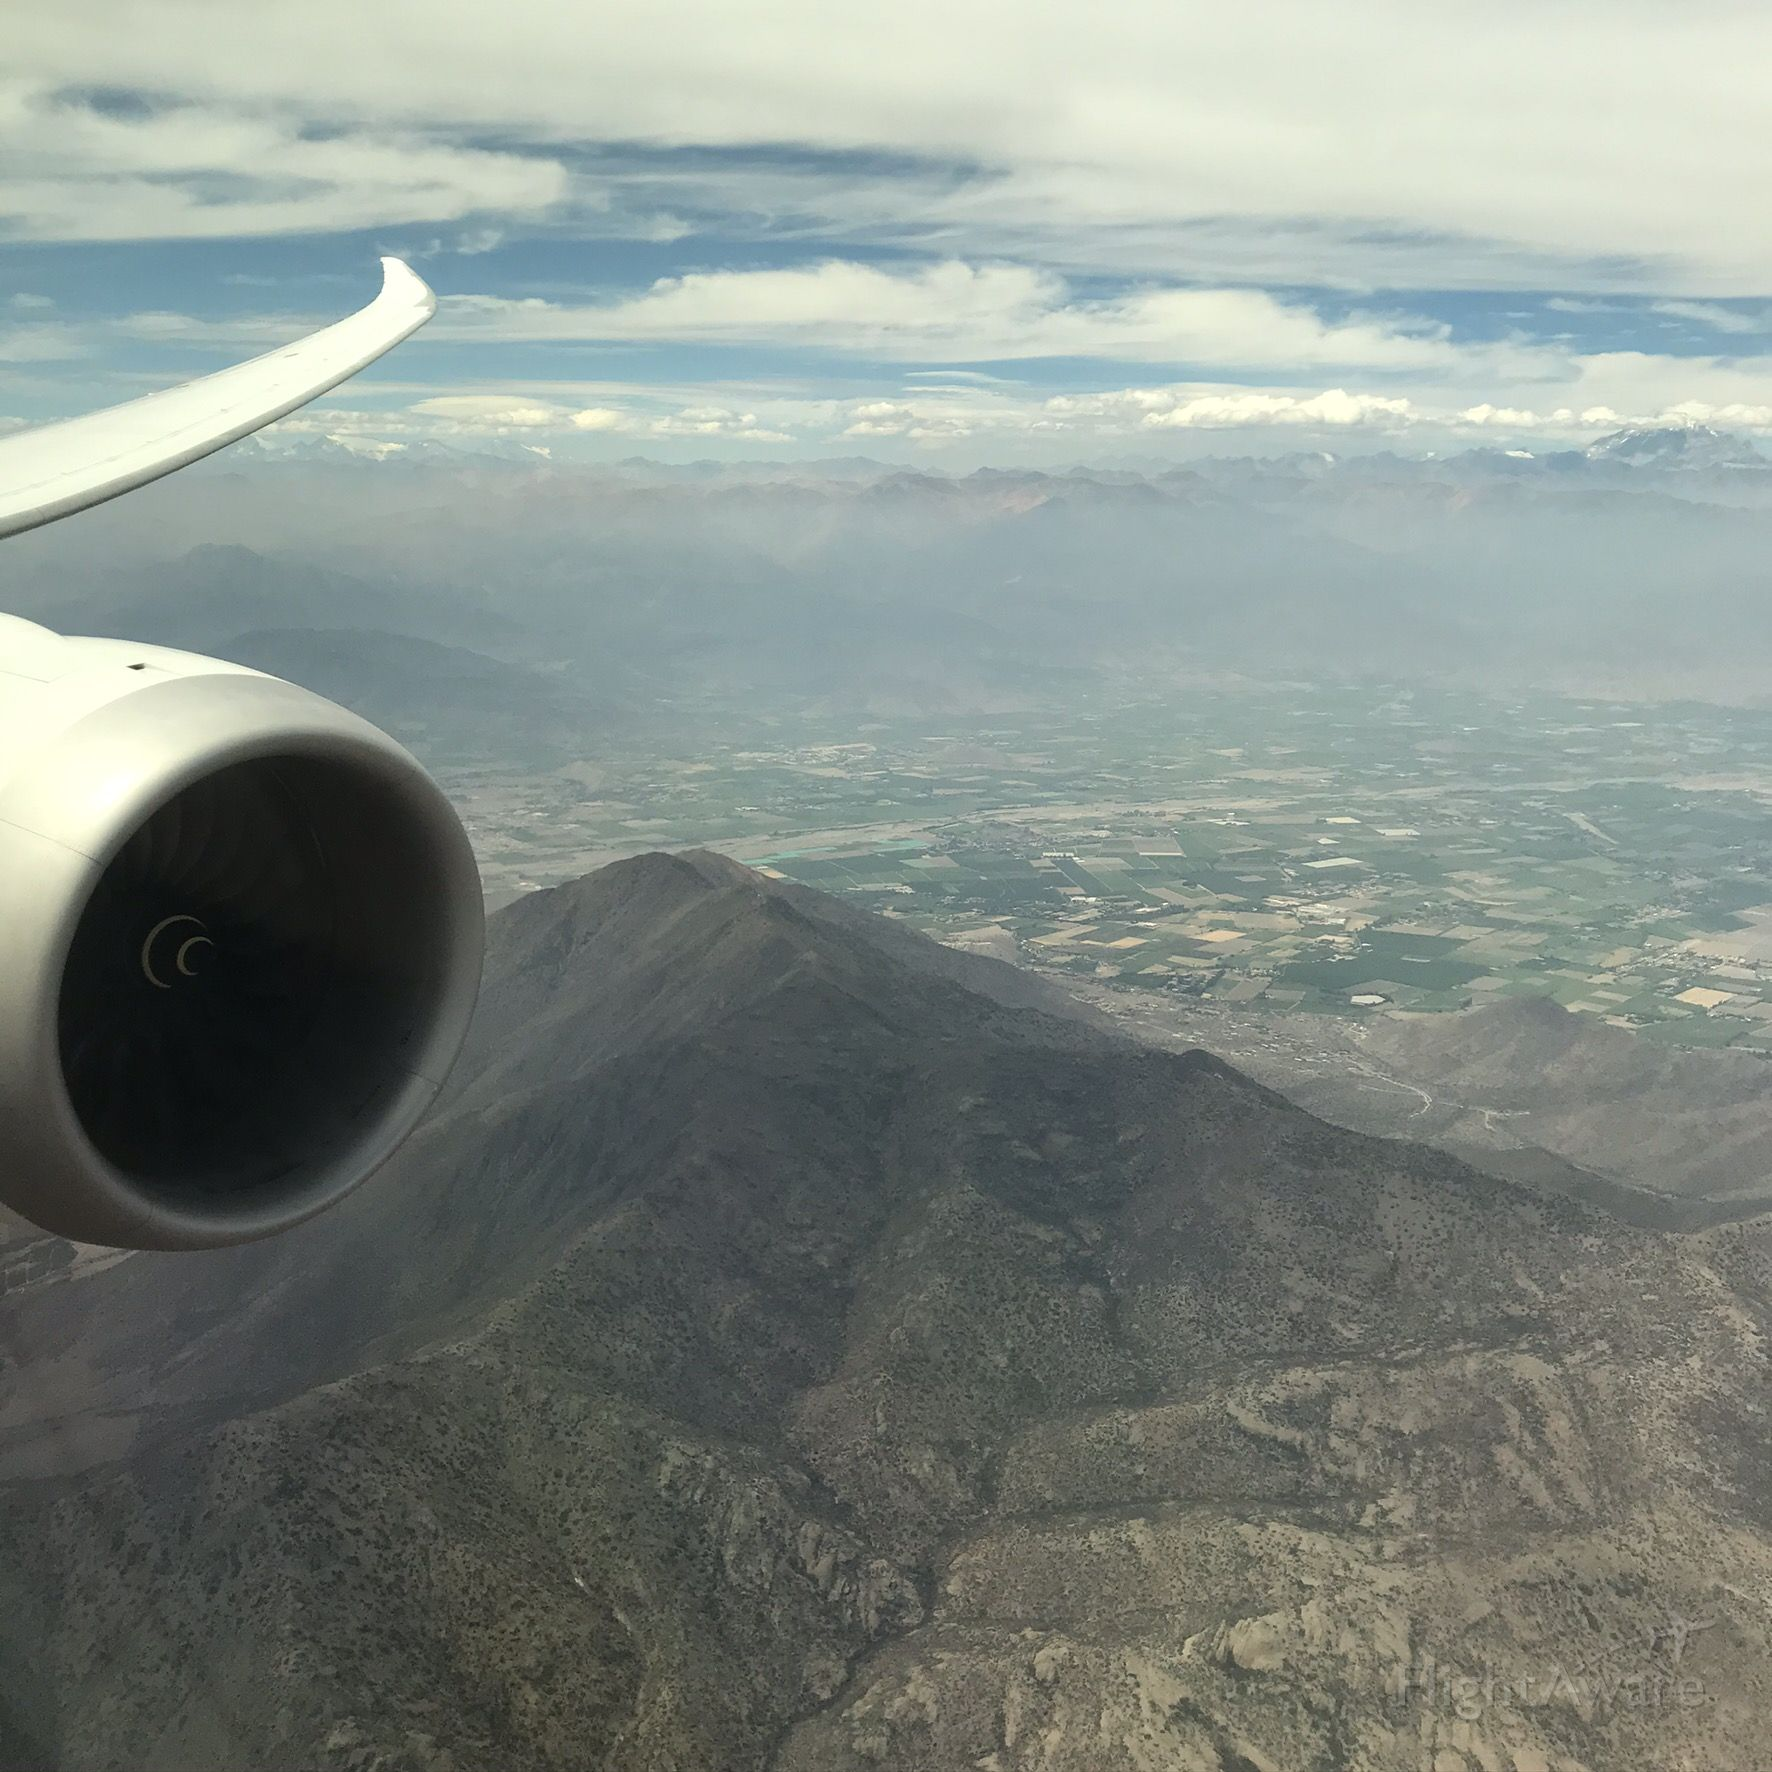 — — - Final approach into Santiago, Chile